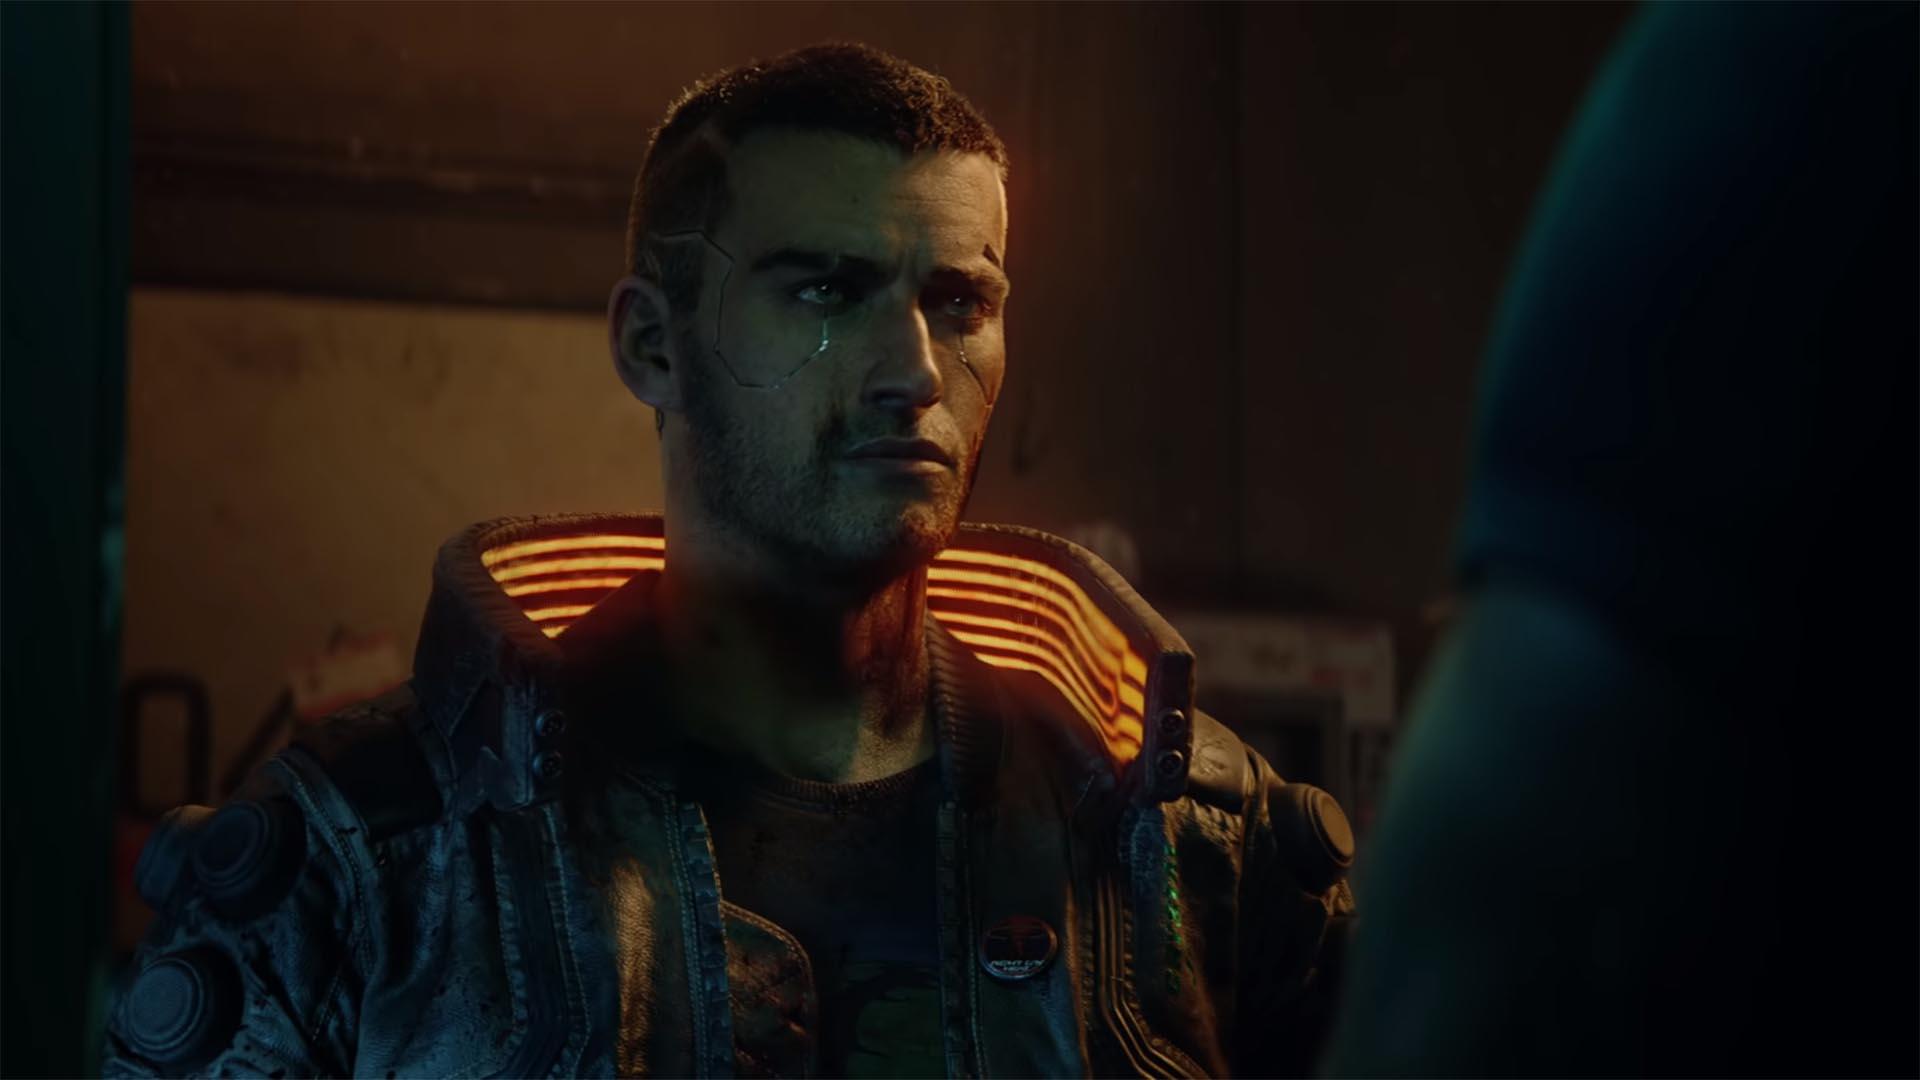 cyberpunk 2077 vs half-life: Alyx